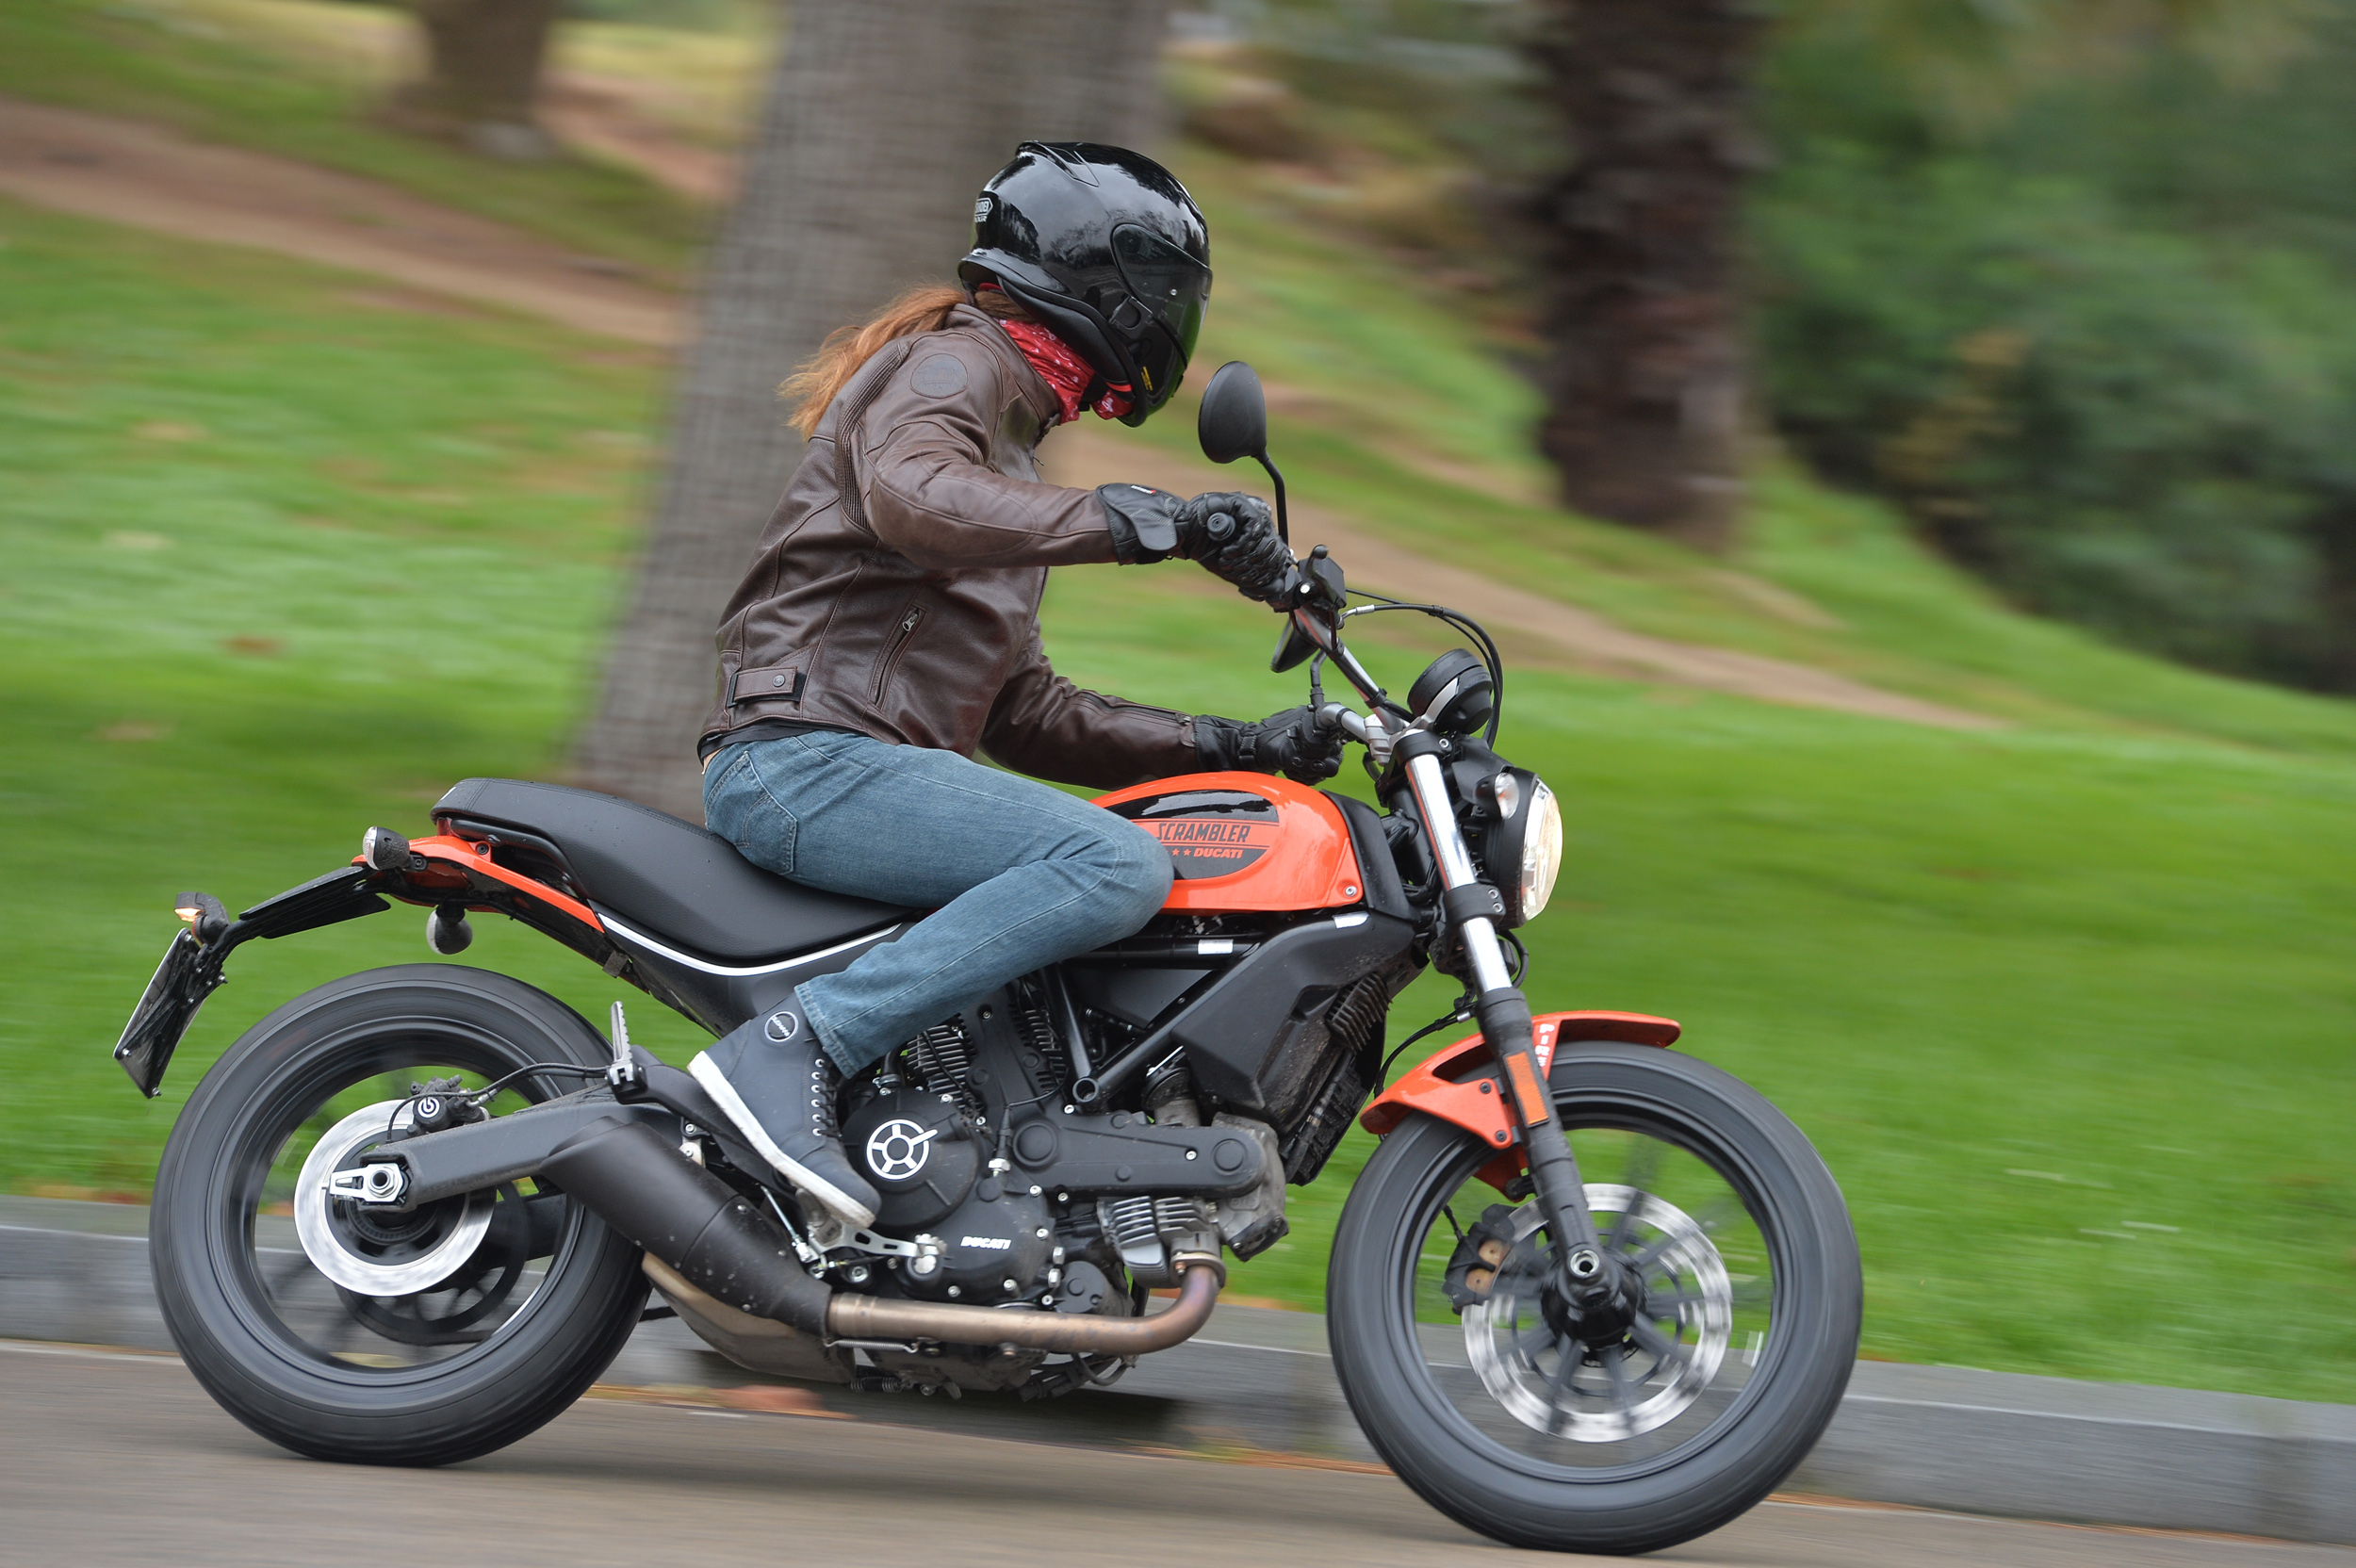 2018 Yamaha R3 Release Date >> 10 Best Beginner Motorcycles Motorcycle Reviews Videos | Autos Post